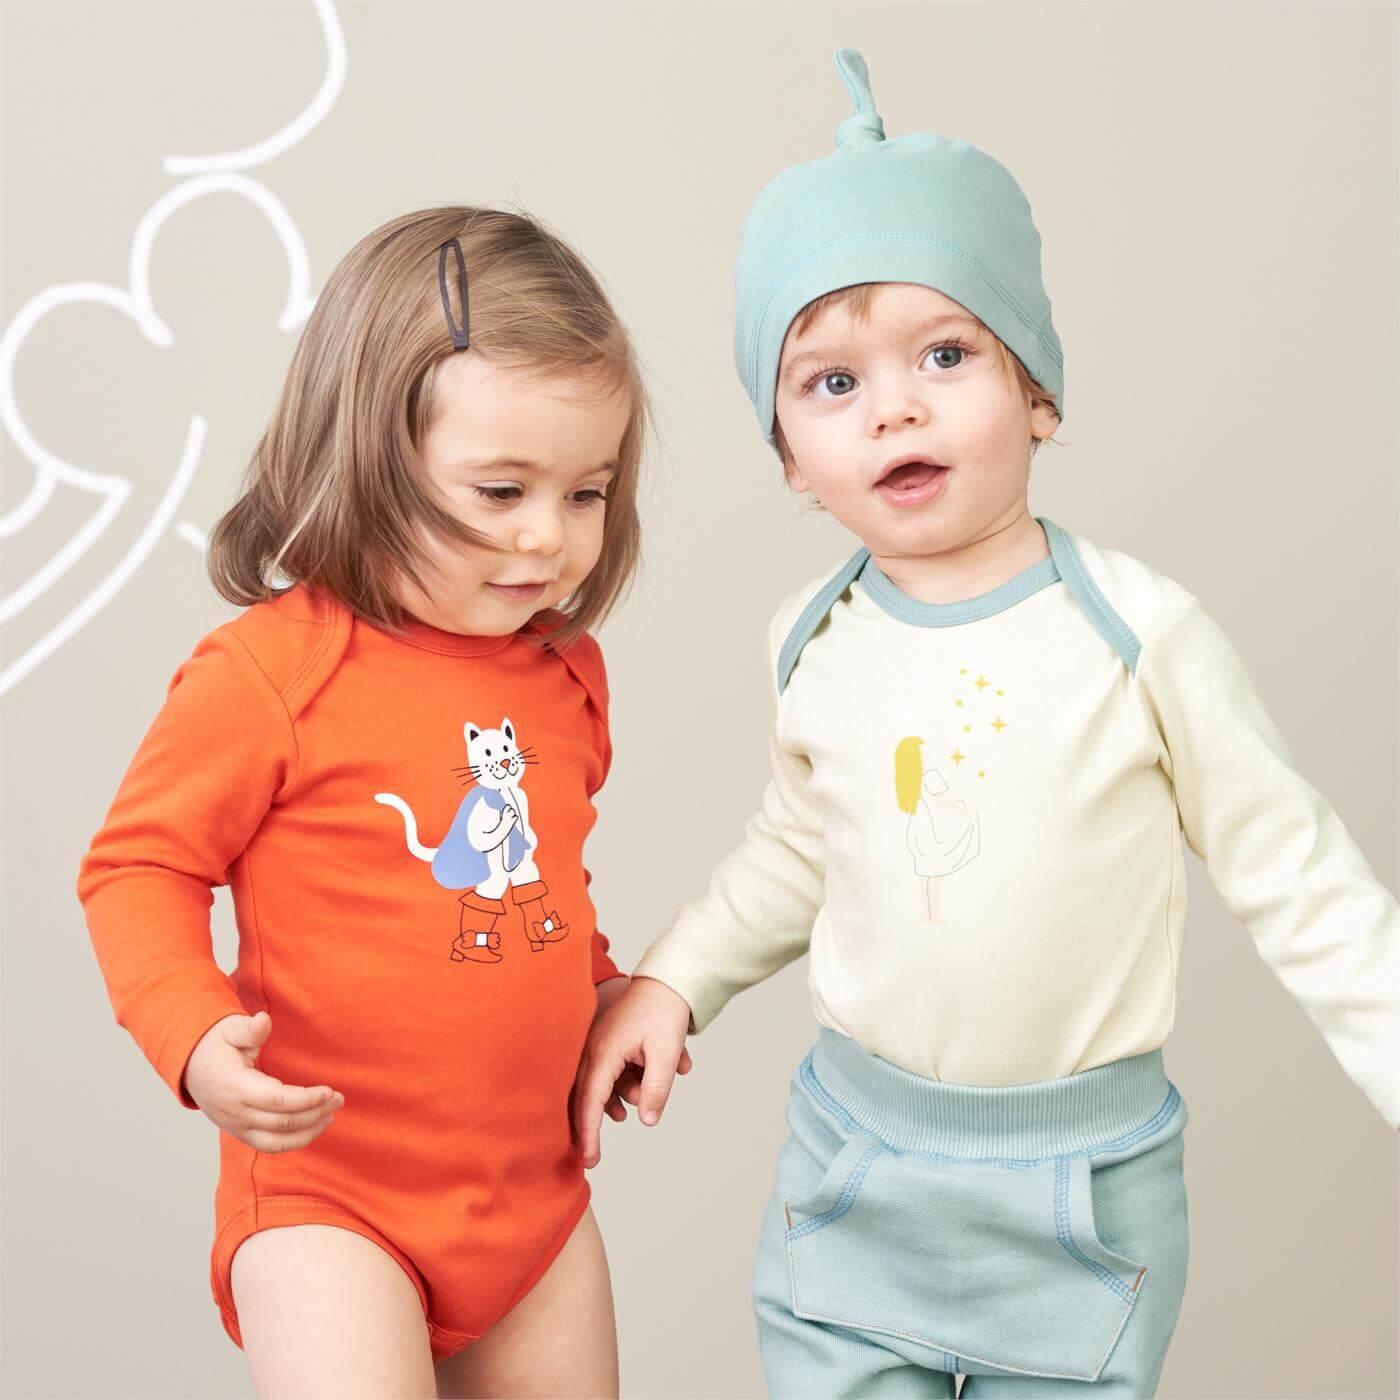 Bio-Babykleidung-3_sizeby_exact_sizewidth_1400_sizeheight_1400